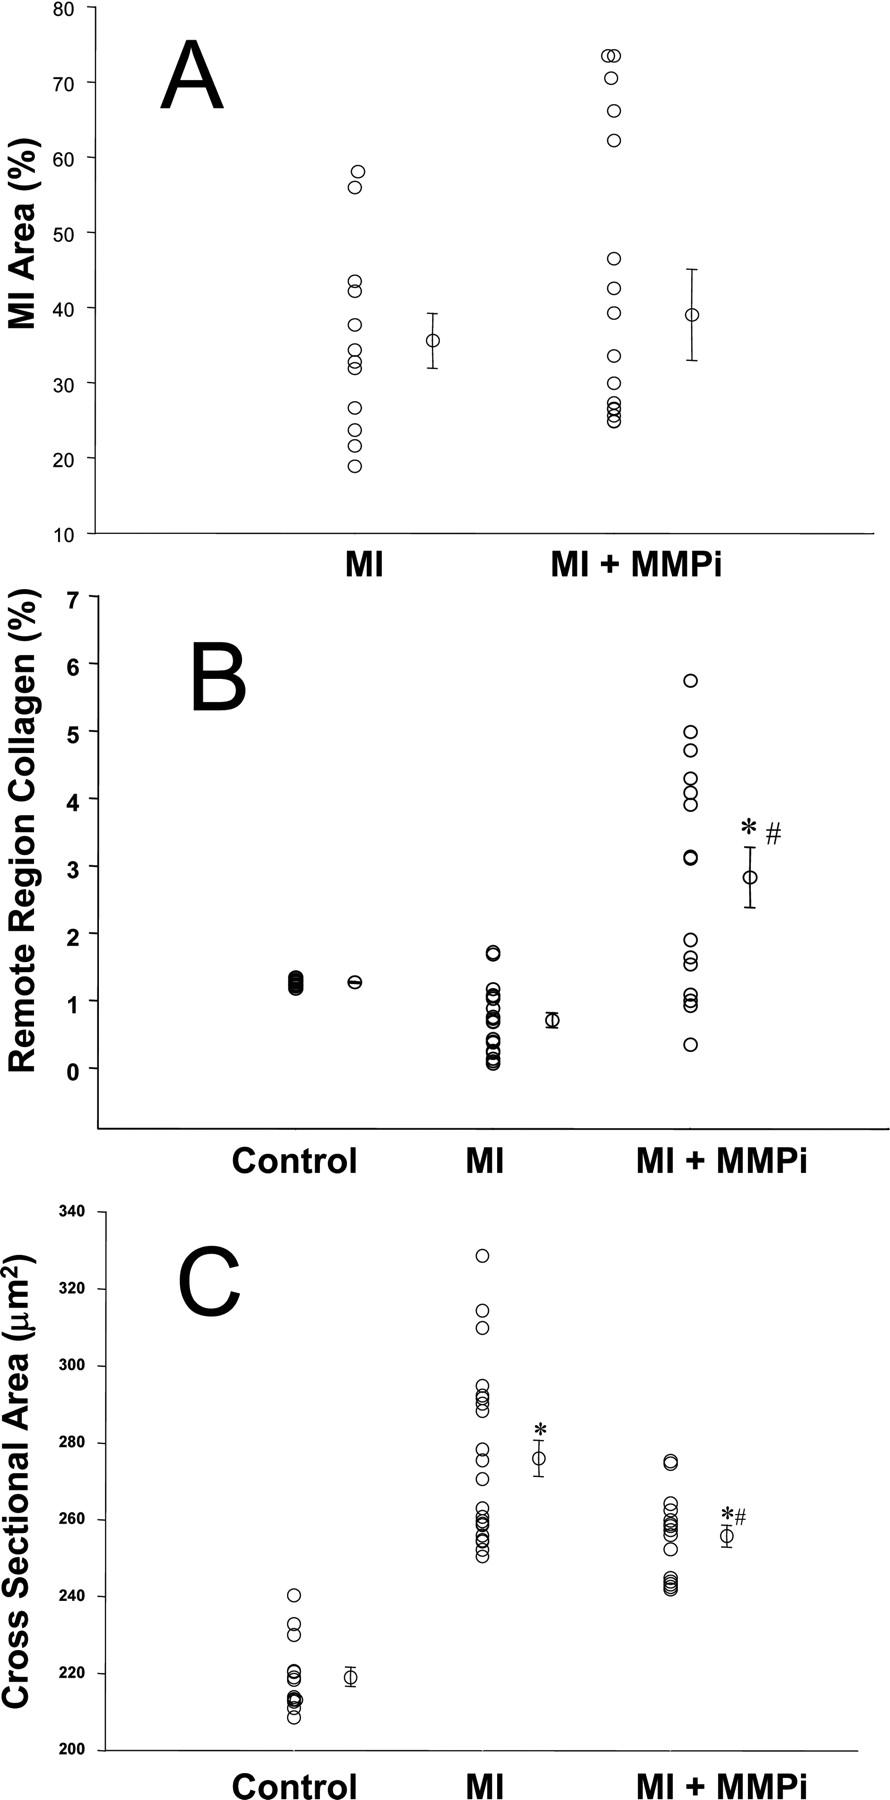 Chronic Matrix Metalloproteinase Inhibition Following